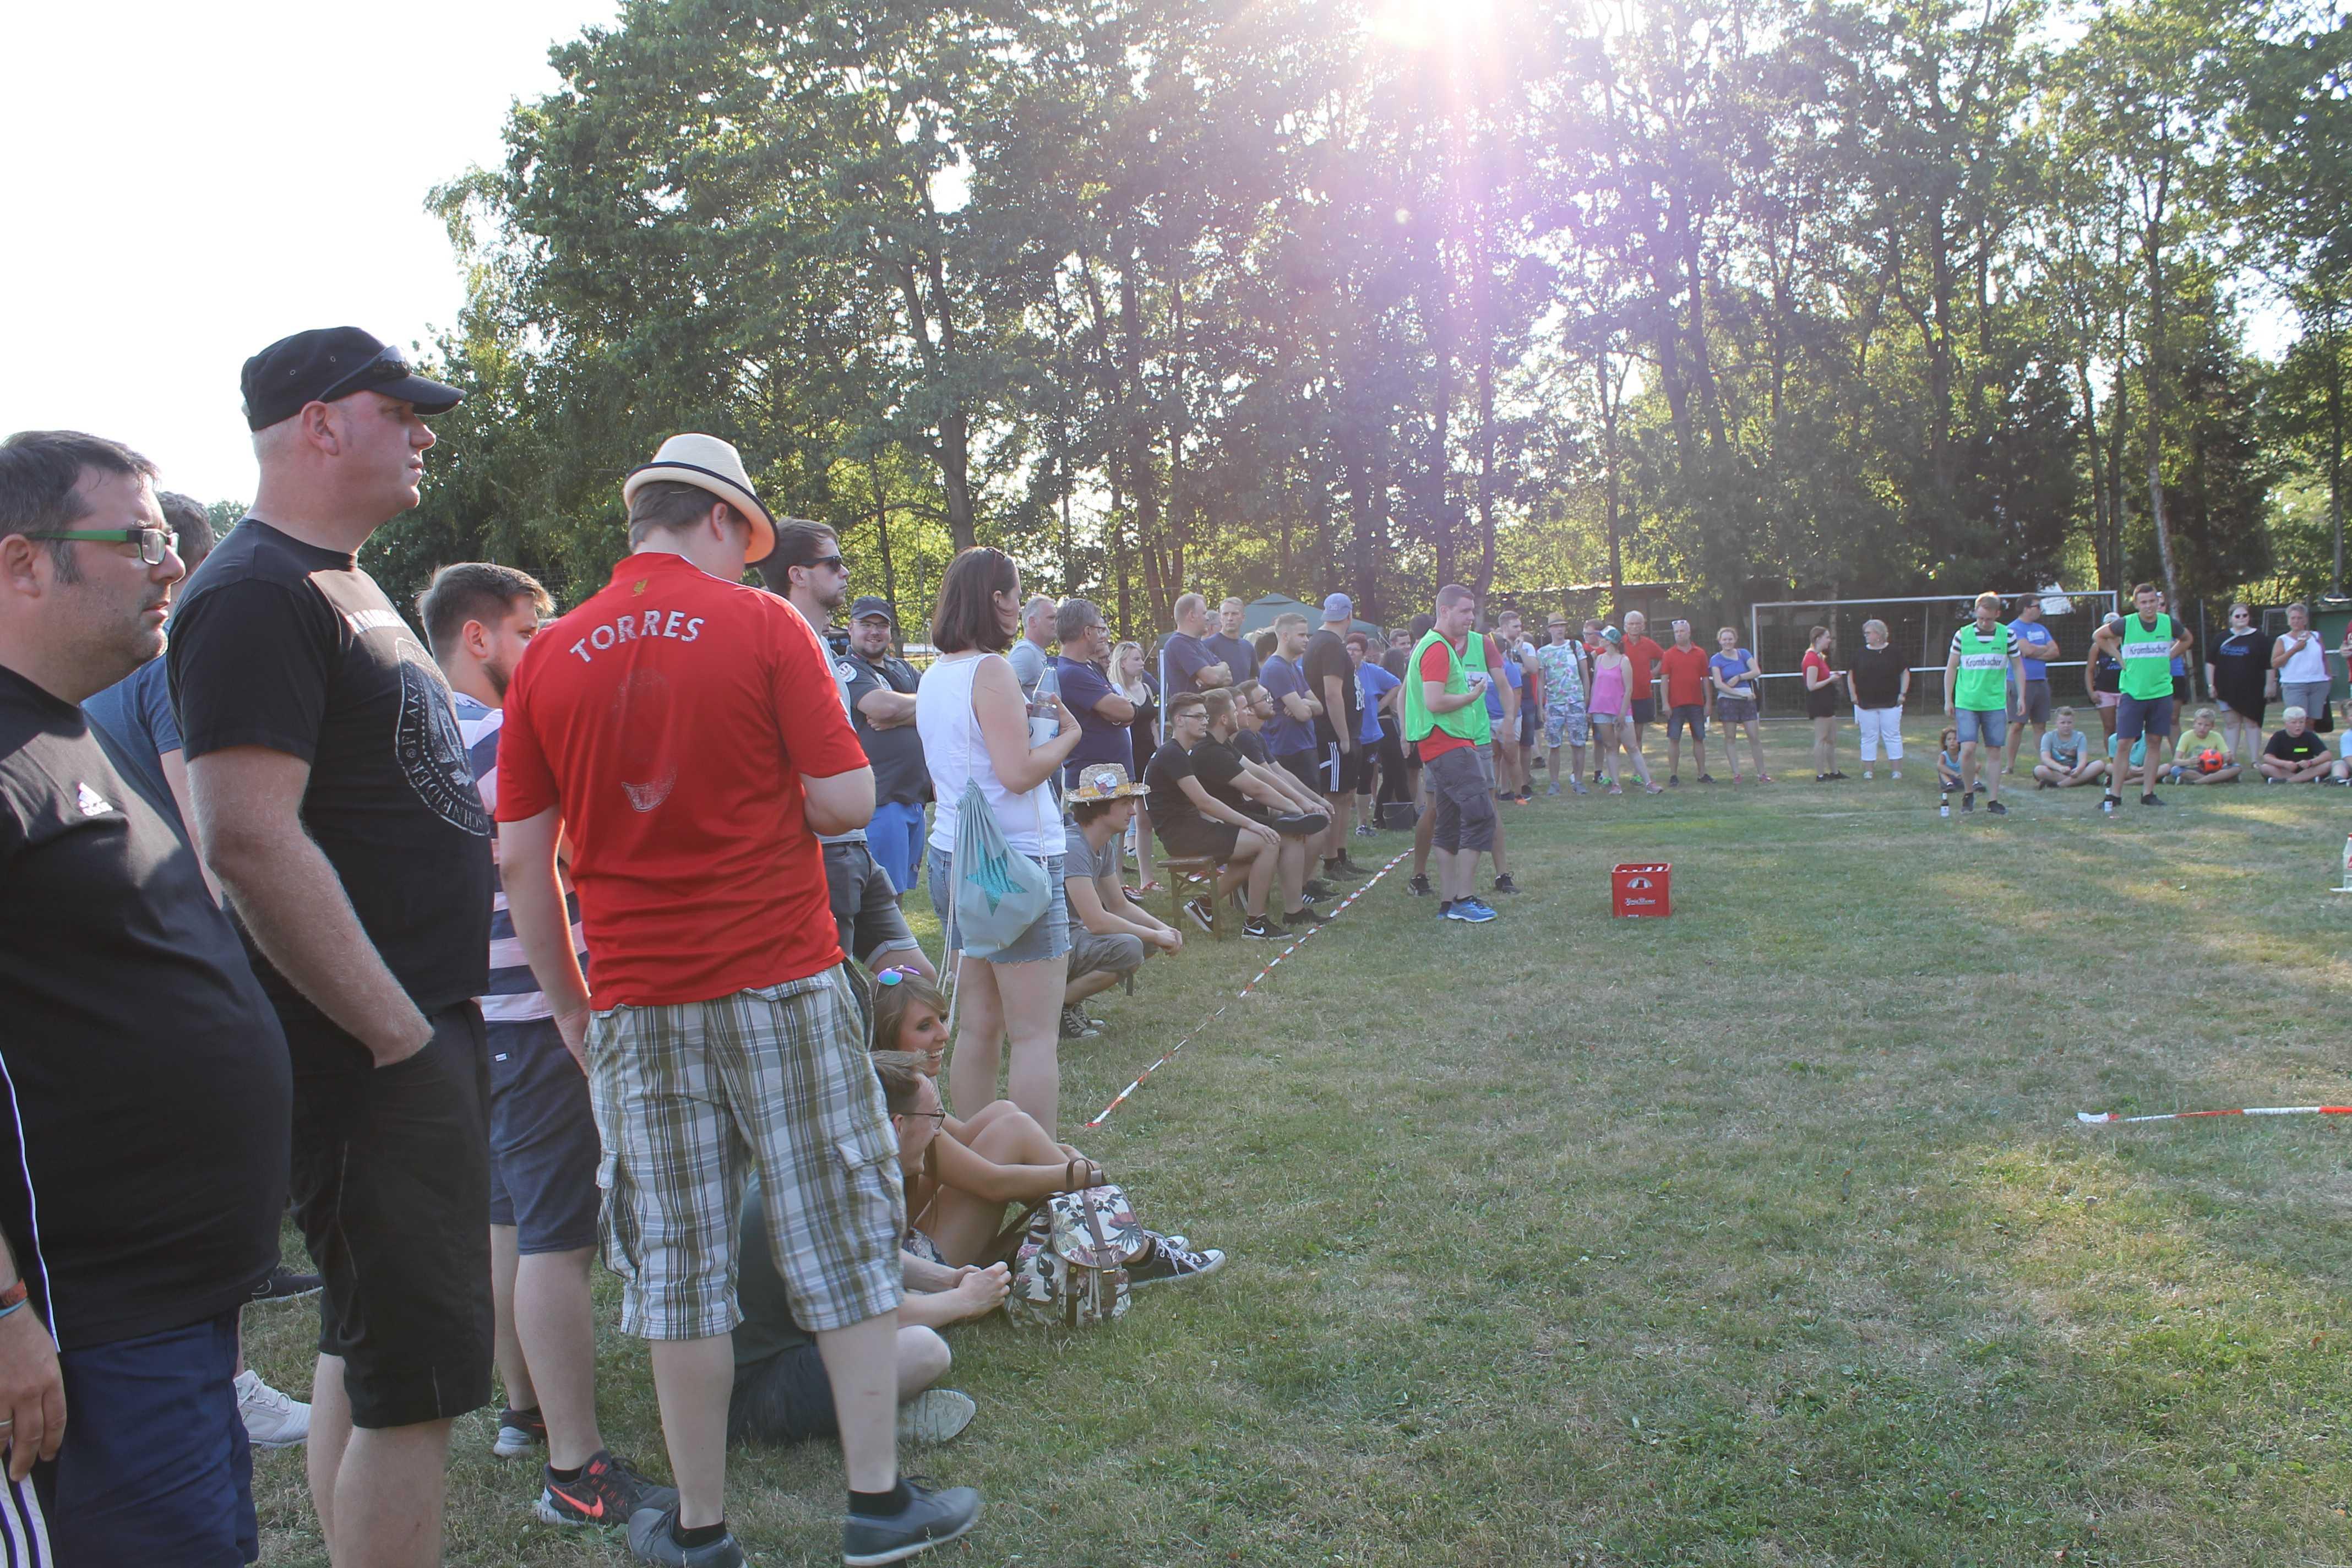 2018-07-27 Sportwoche - Flunkyball Turnier (8)